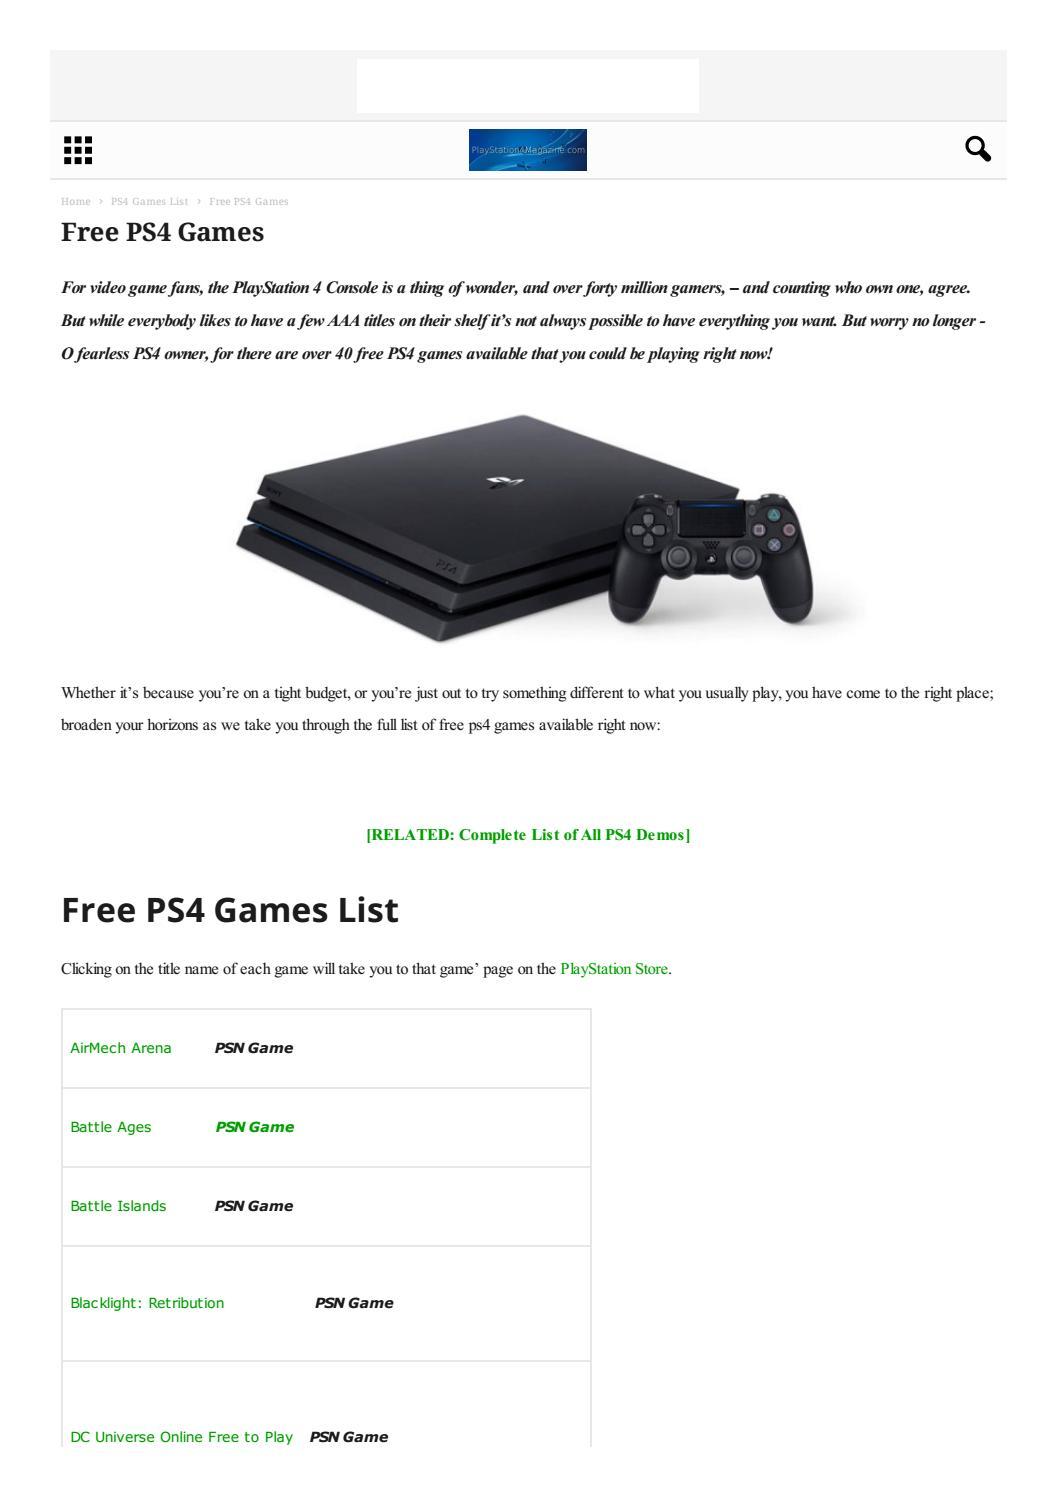 Free ps4 games pdf by TECH365 Digital Media - issuu